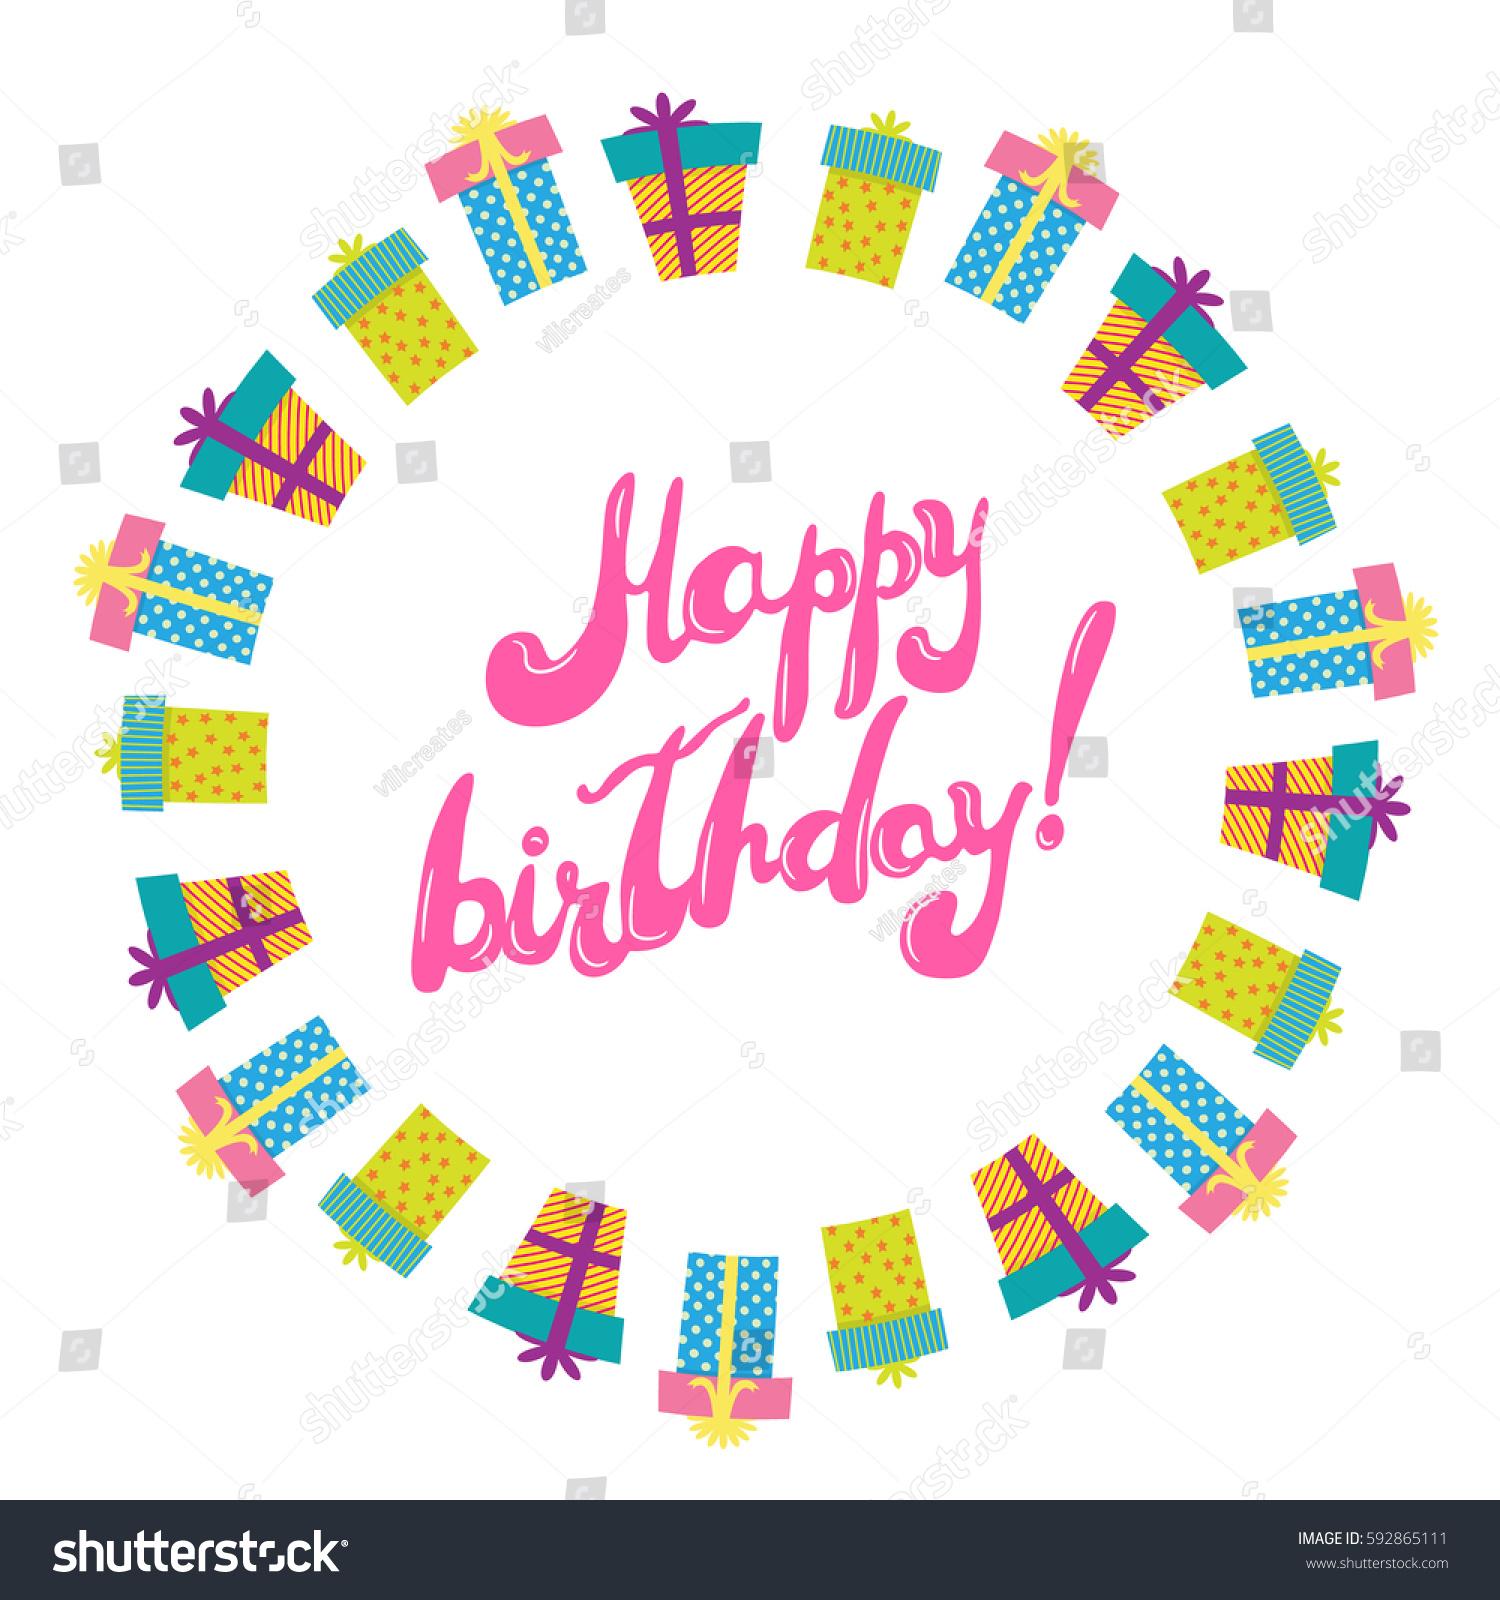 edit vectors free online  birthday card  shutterstock editor